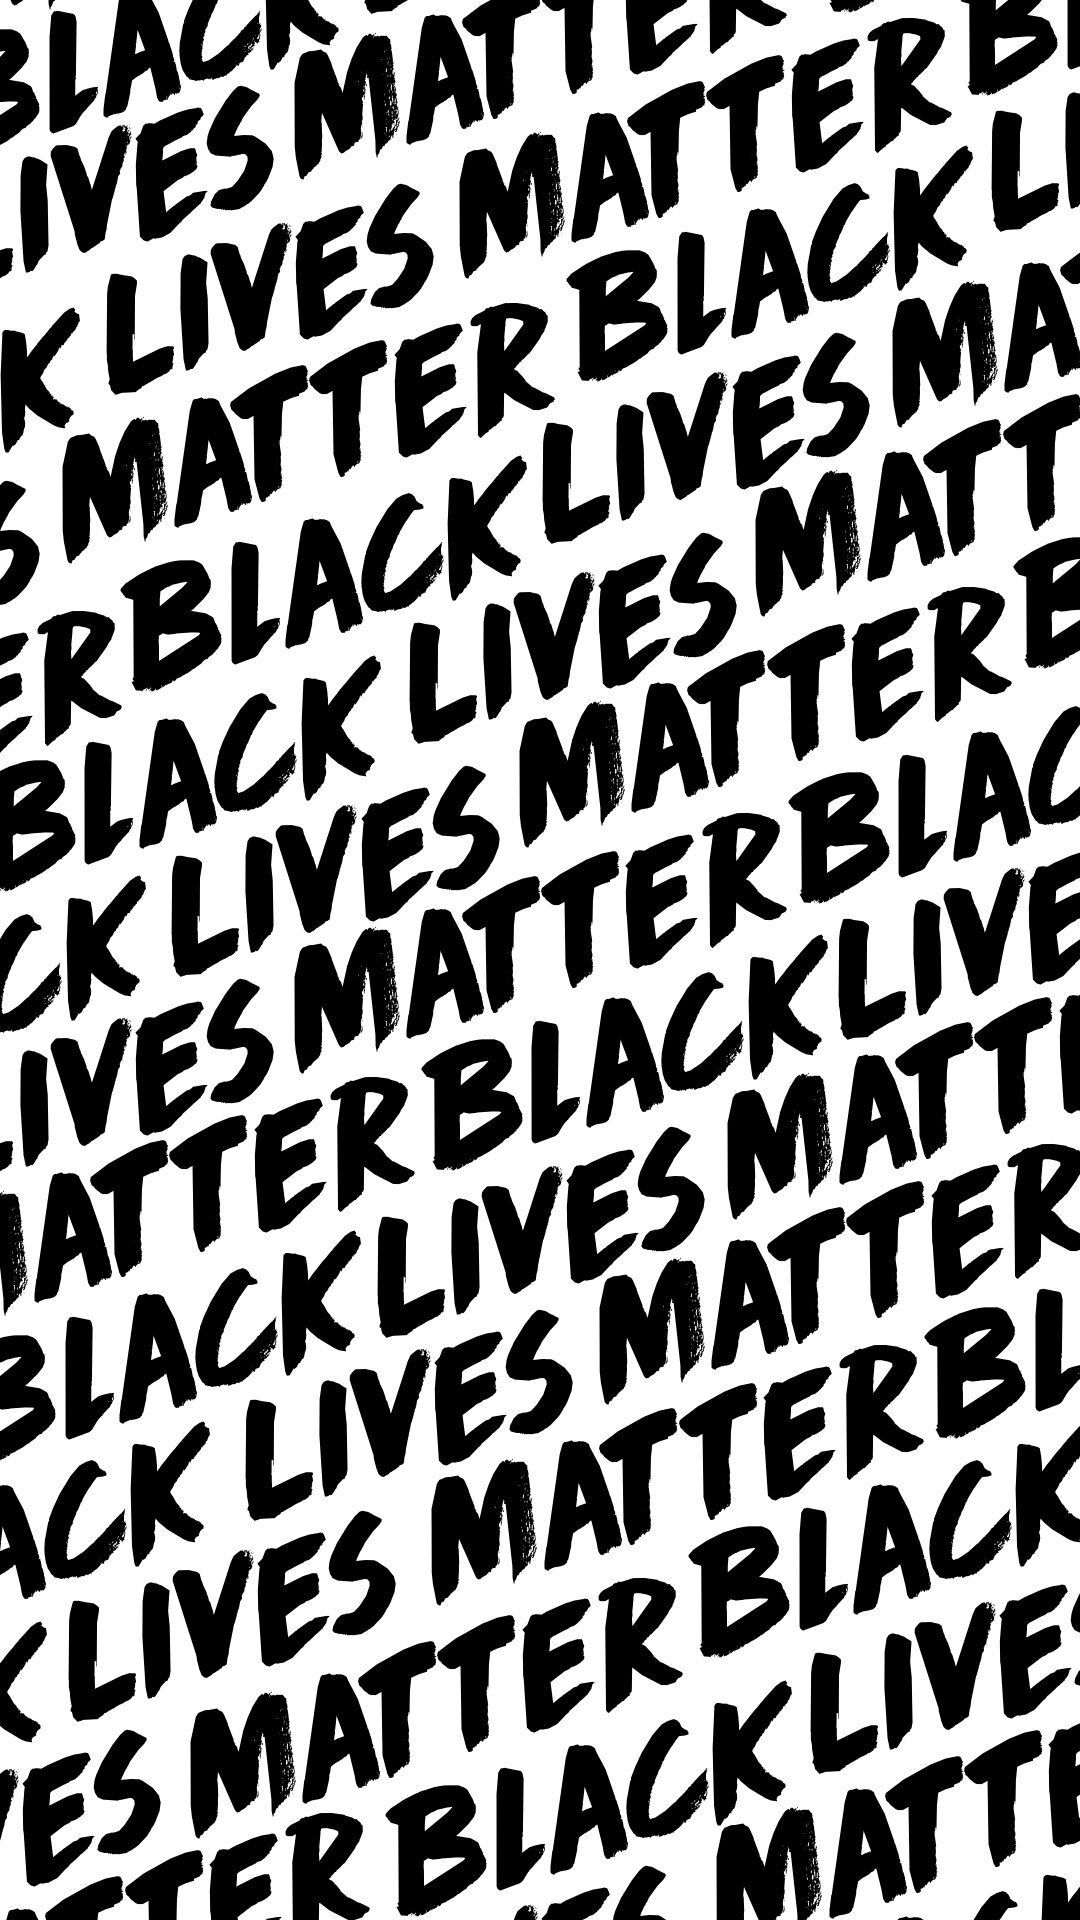 Black Lives Matter Wallpaper For Mobile Phone Tablet Desktop Computer And Other Devices Hd And 4k Wallp Black Lives Matter Art Black Lives Matter Black Lives